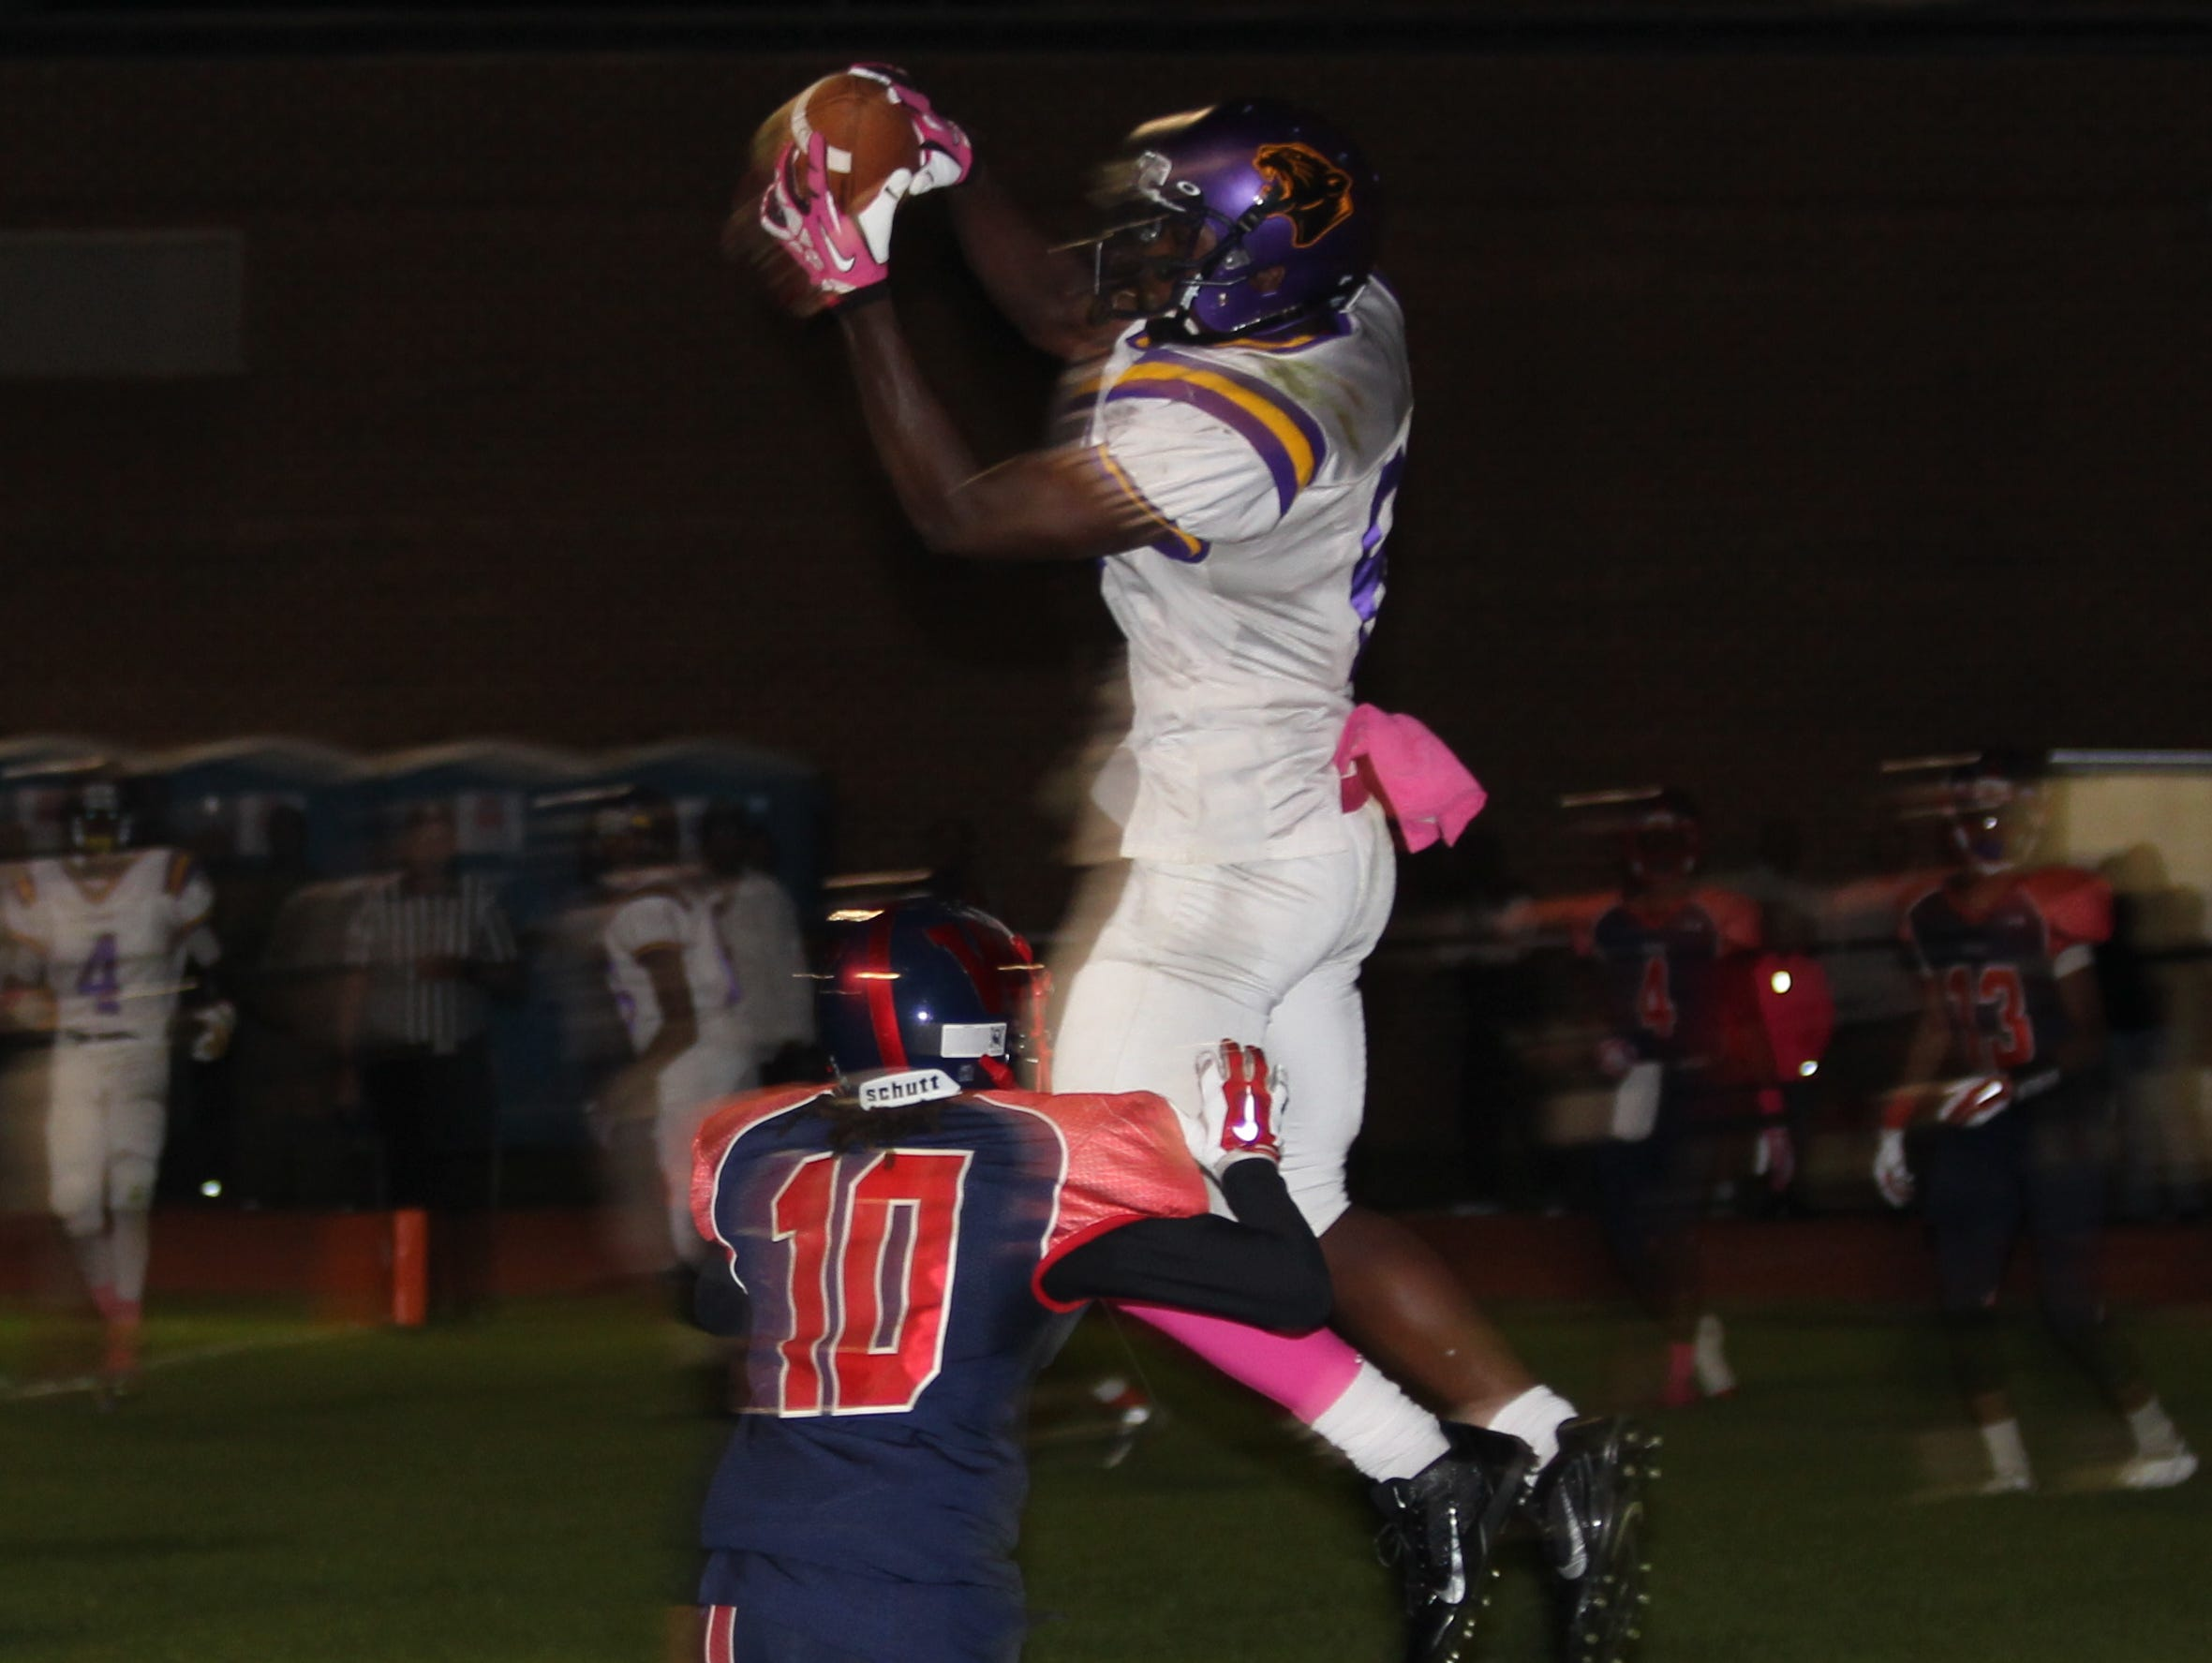 Brad Hawkins Jr. makes a catch for Camden (N.J.) High School.